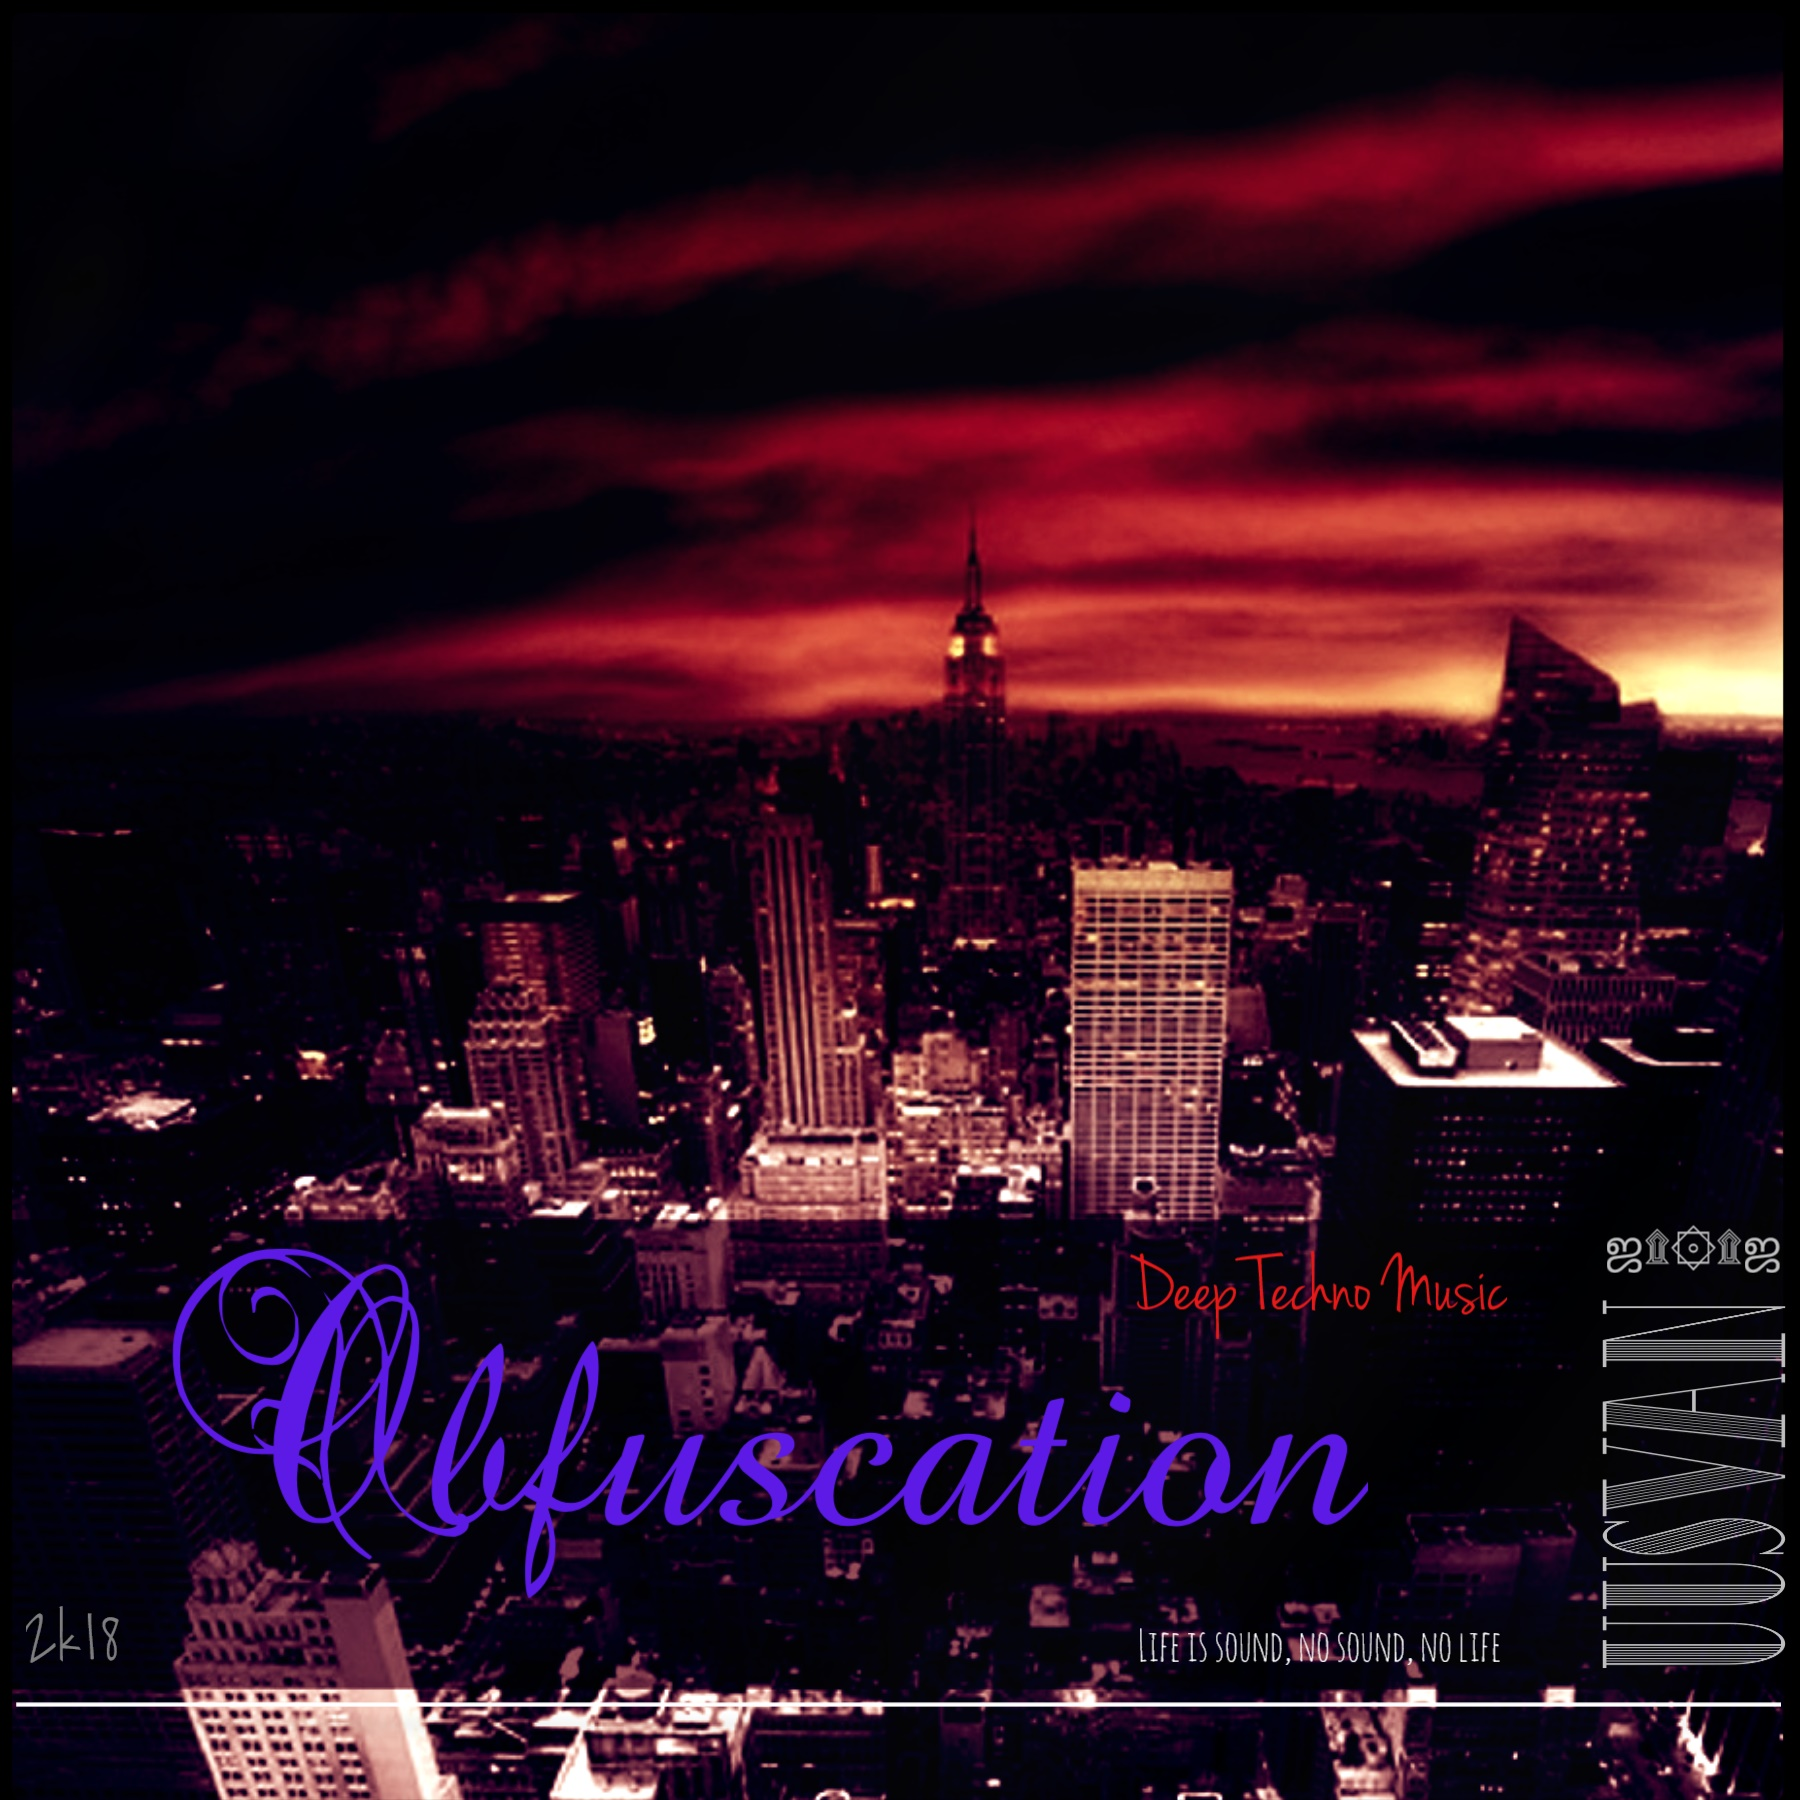 UUSVAN - Obfuscation (D & T 2k18)